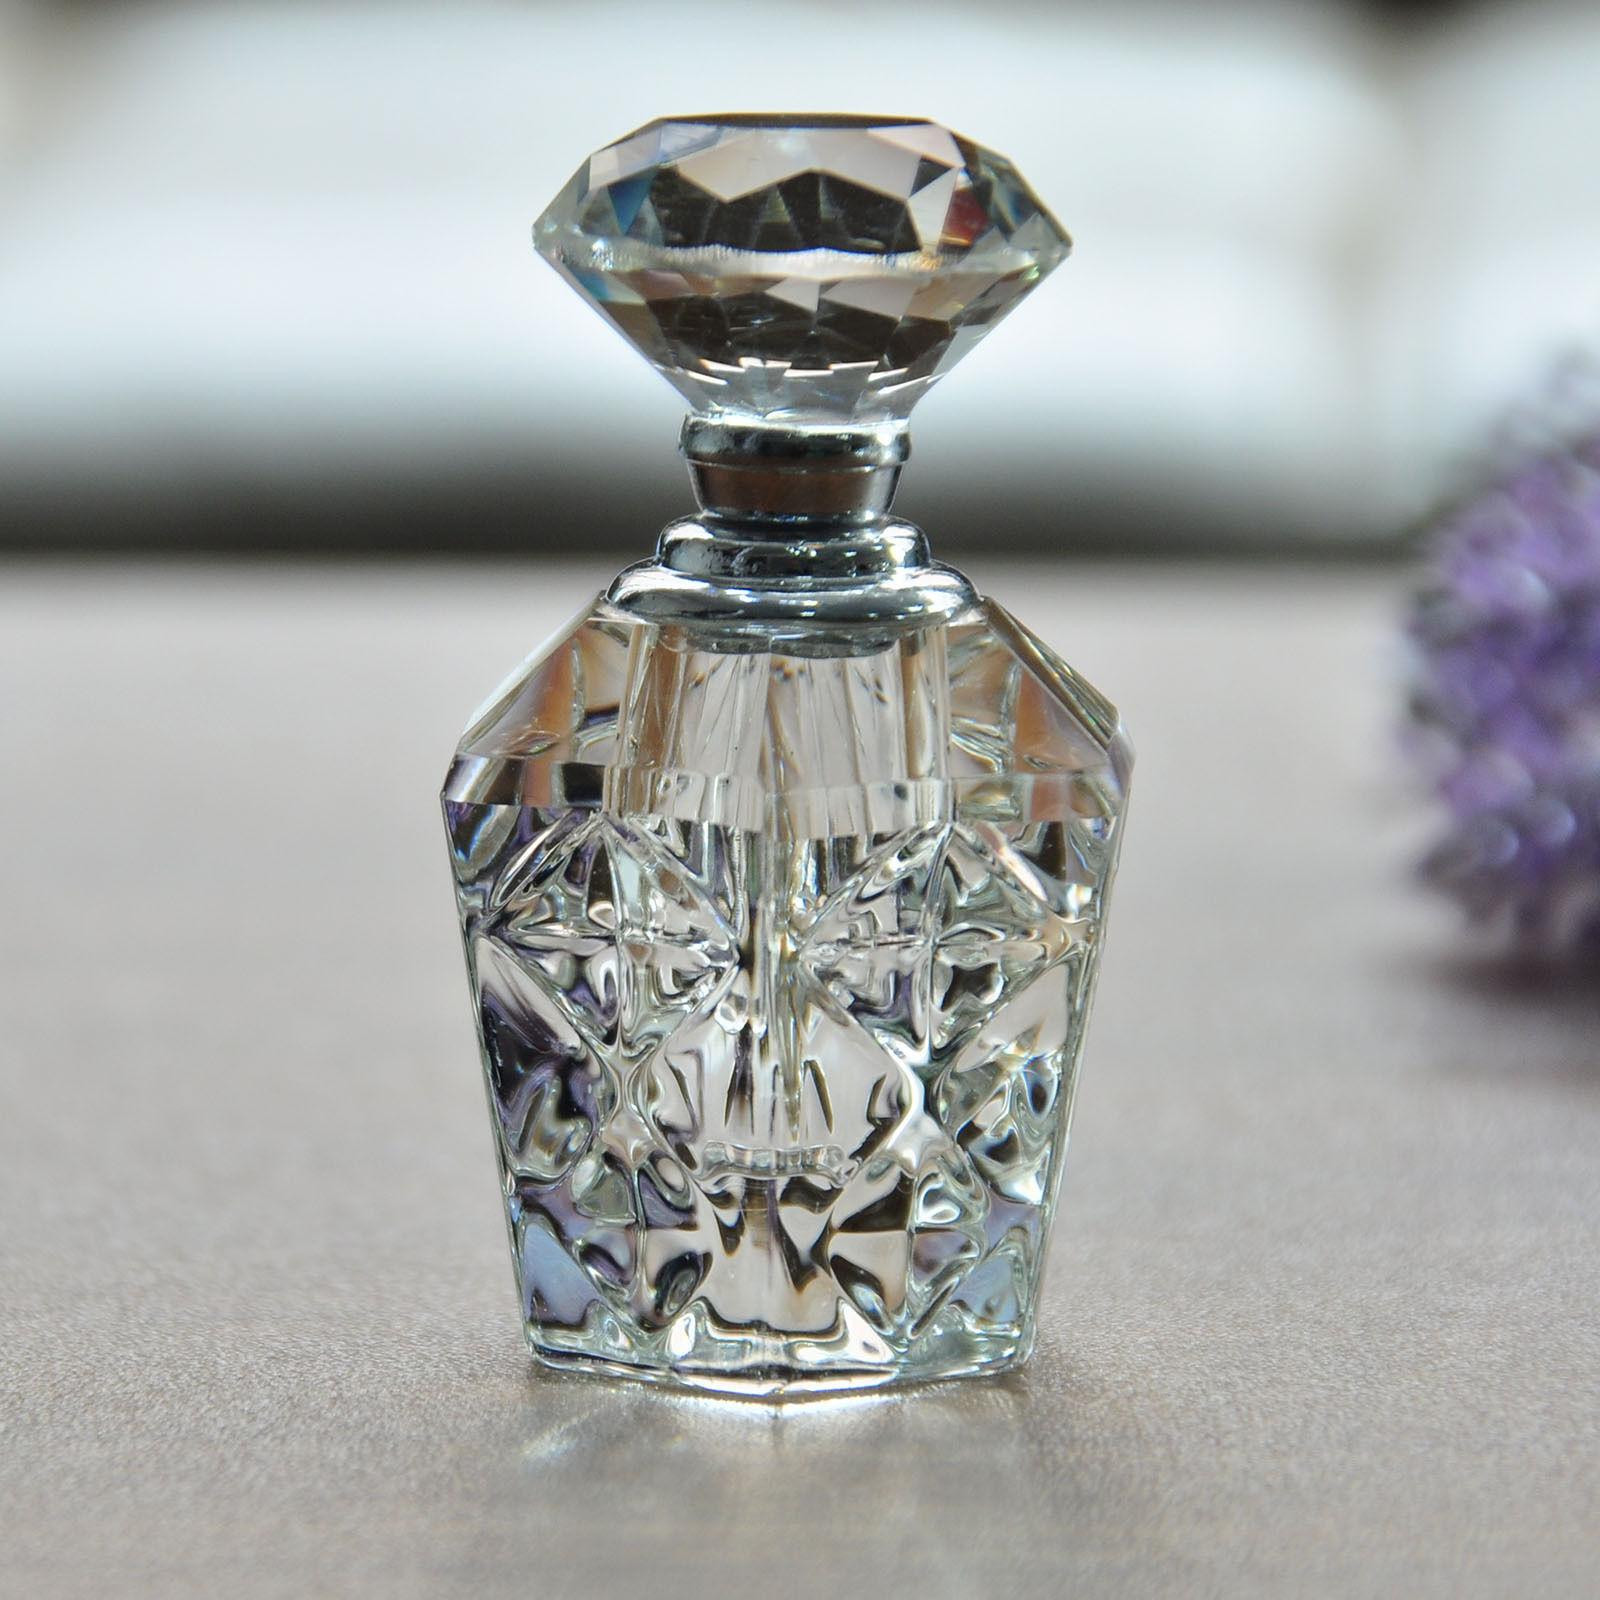 Refillable Perfume Bottle Macy S: Vintage Empty Refillable Crystal Cut Glass Perfume Bottle Diamond Stopper Gift